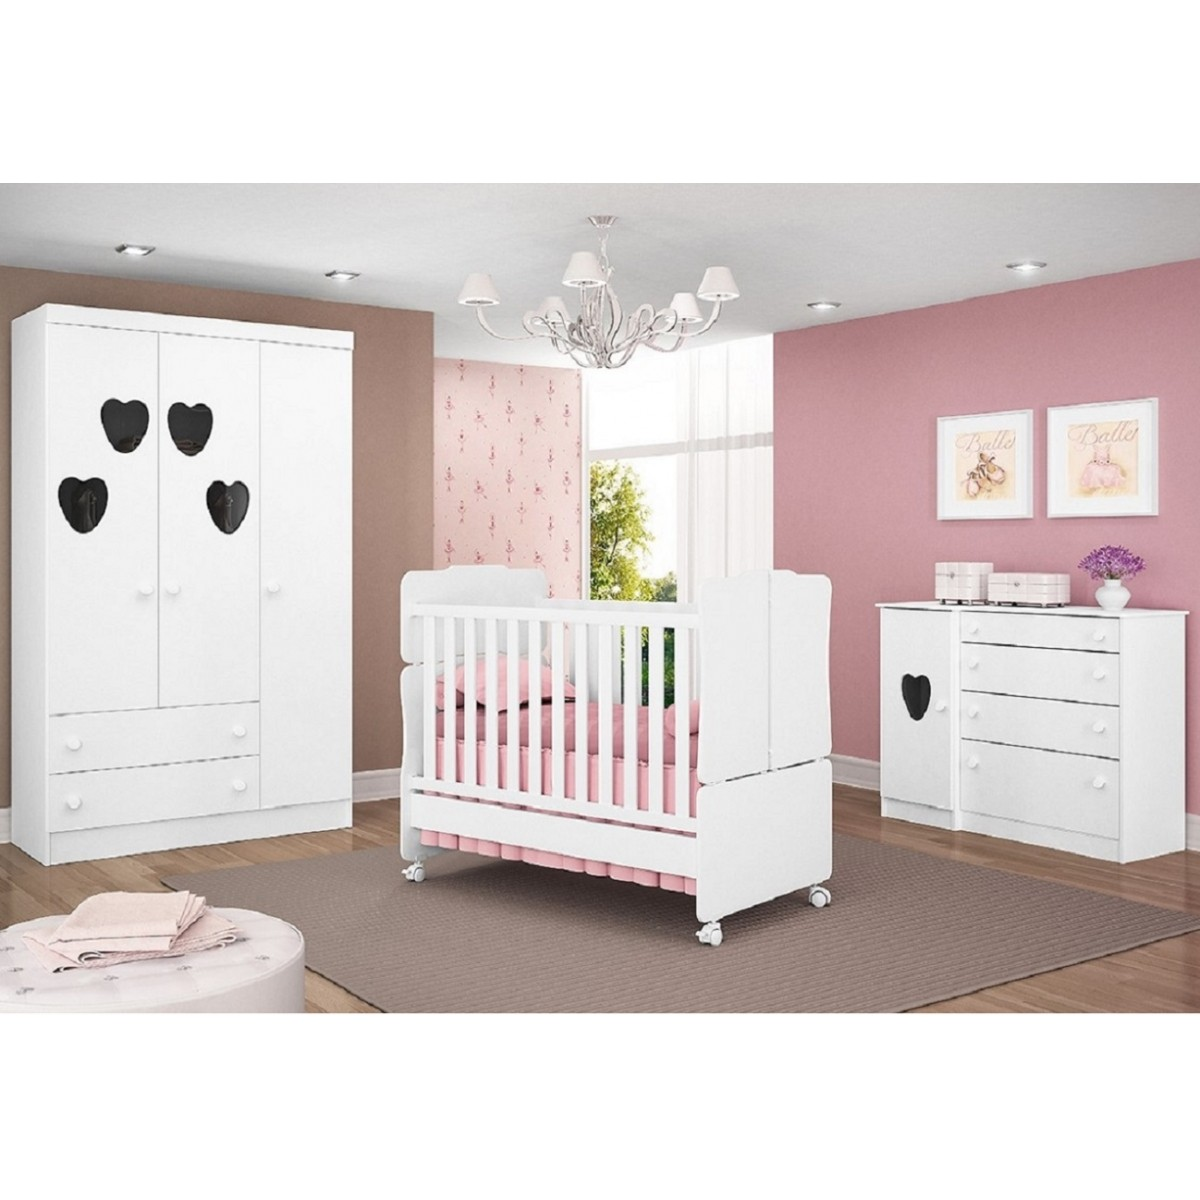 Quarto para Bebê com Guarda Roupa 3 Portas + Cômoda Sapateira + Berço Mini Cama - QMovi